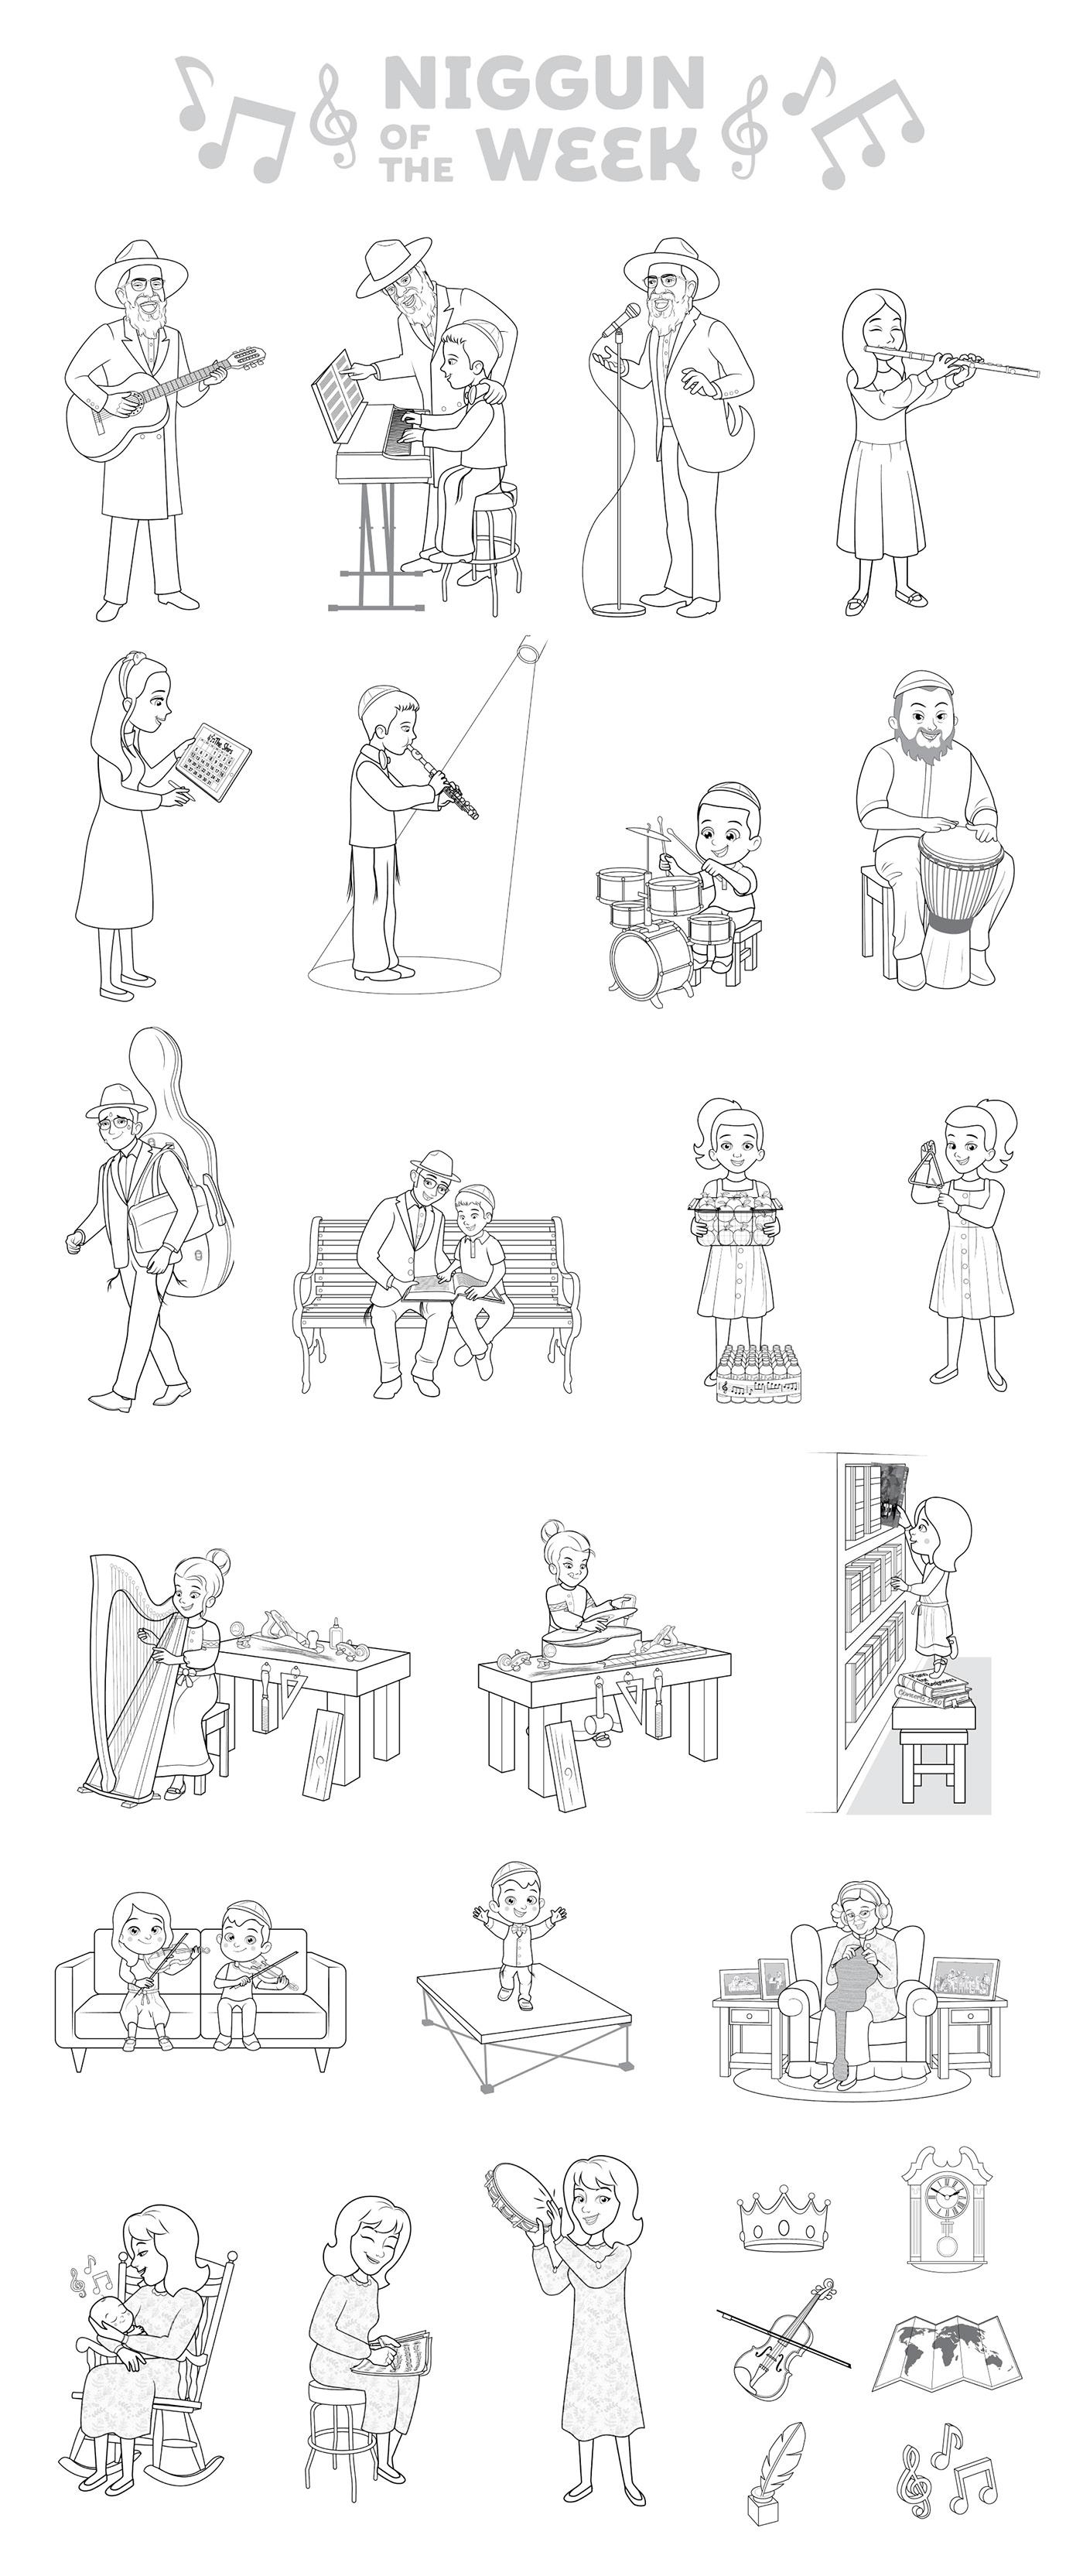 Image may contain: sketch, drawing and cartoon